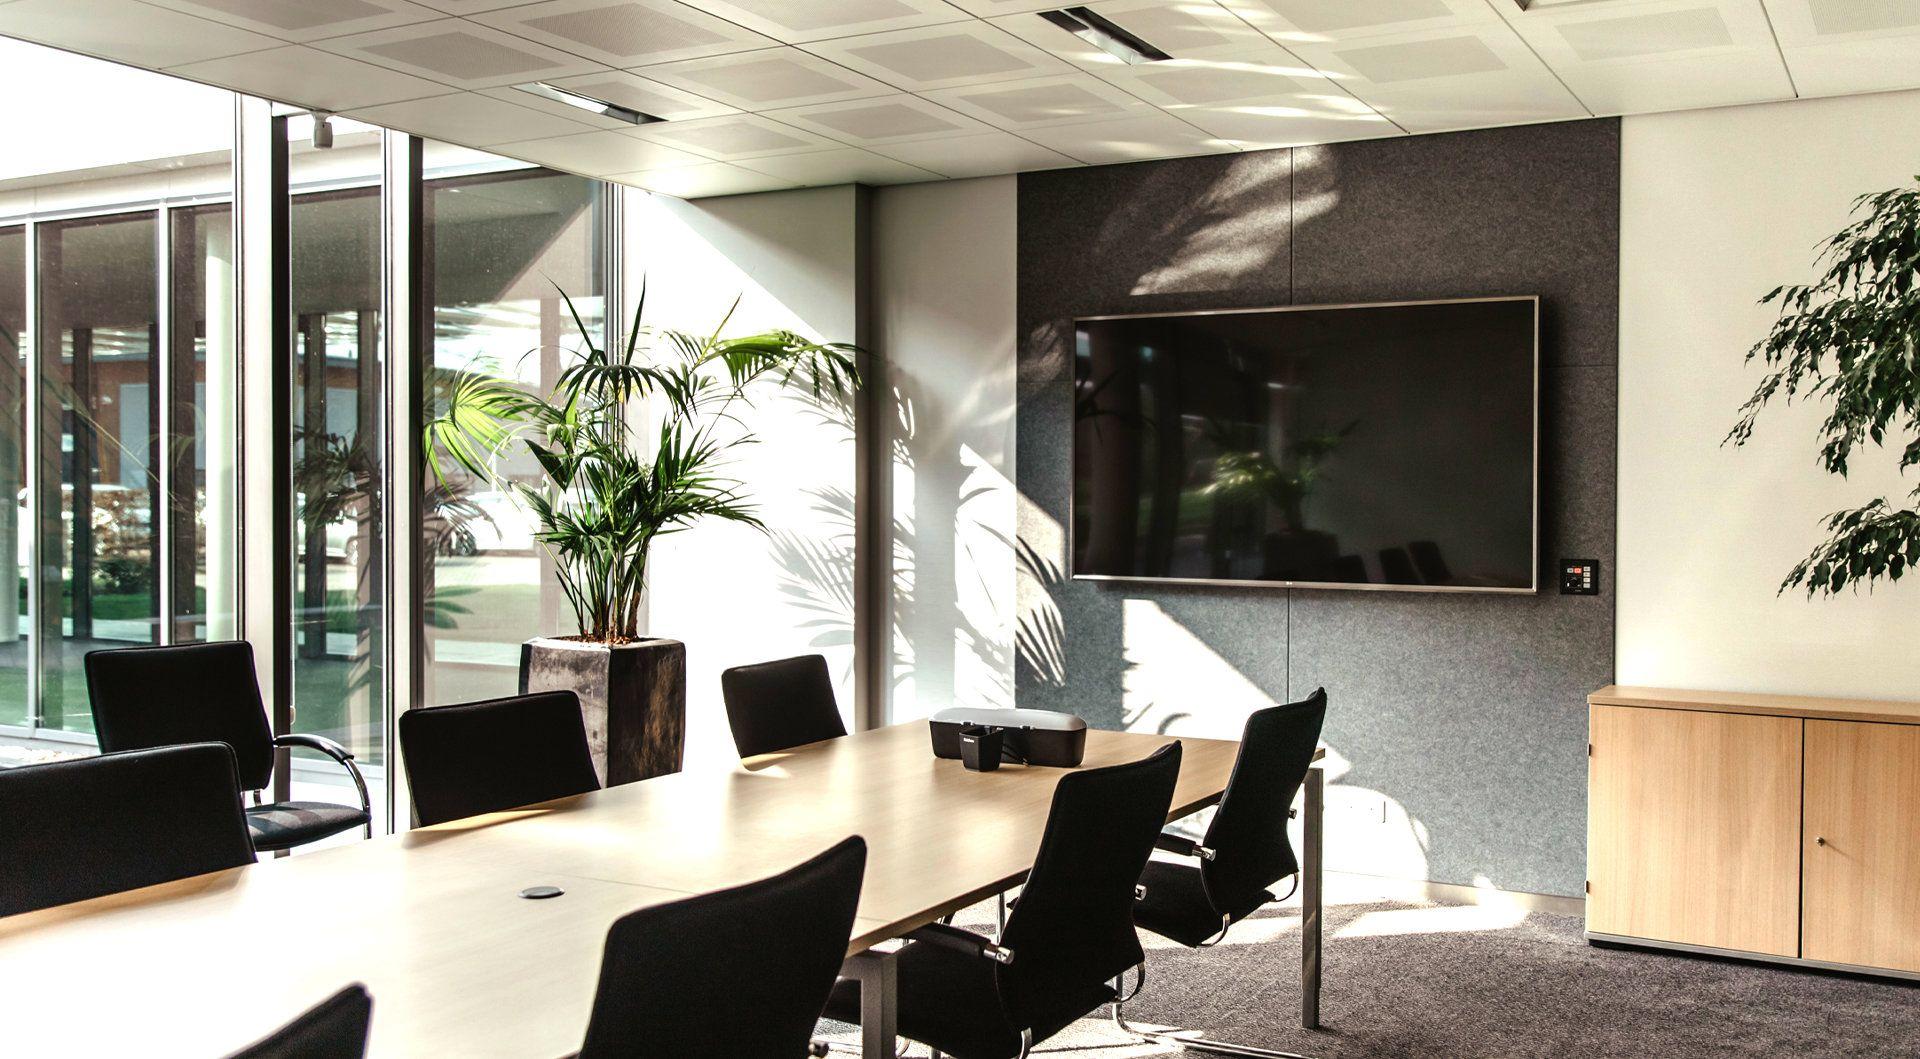 "Dekker Industrial Design DID010.002.010-02 flat panel vloer standaard 43,2 cm (17"") Vaste flatscreen vloerstandaard Wit - Case studie de vries"